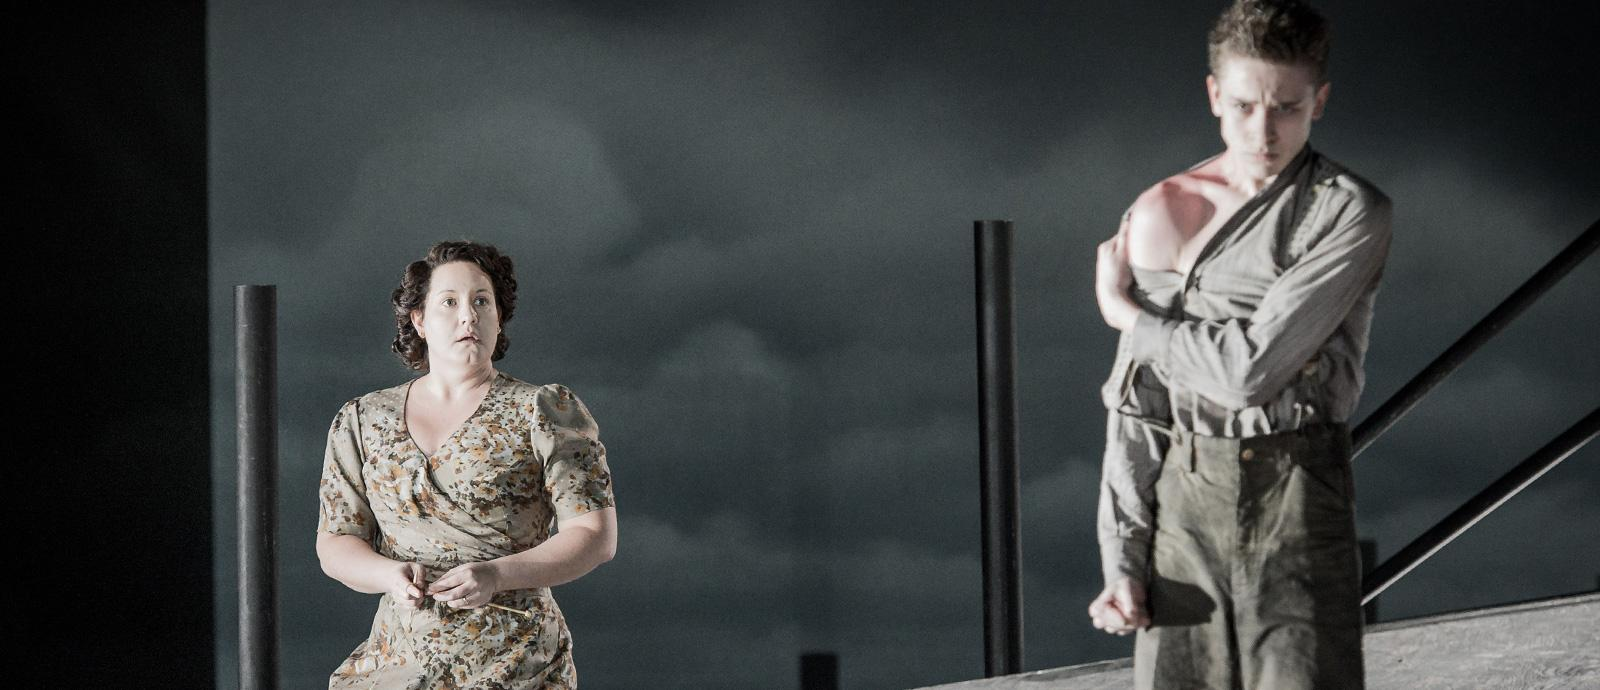 ENO Peter Grimes: Elza Van Den Heever as Ellen Orford and Timothy Kirrage as the Apprentice (c) Robert Workman